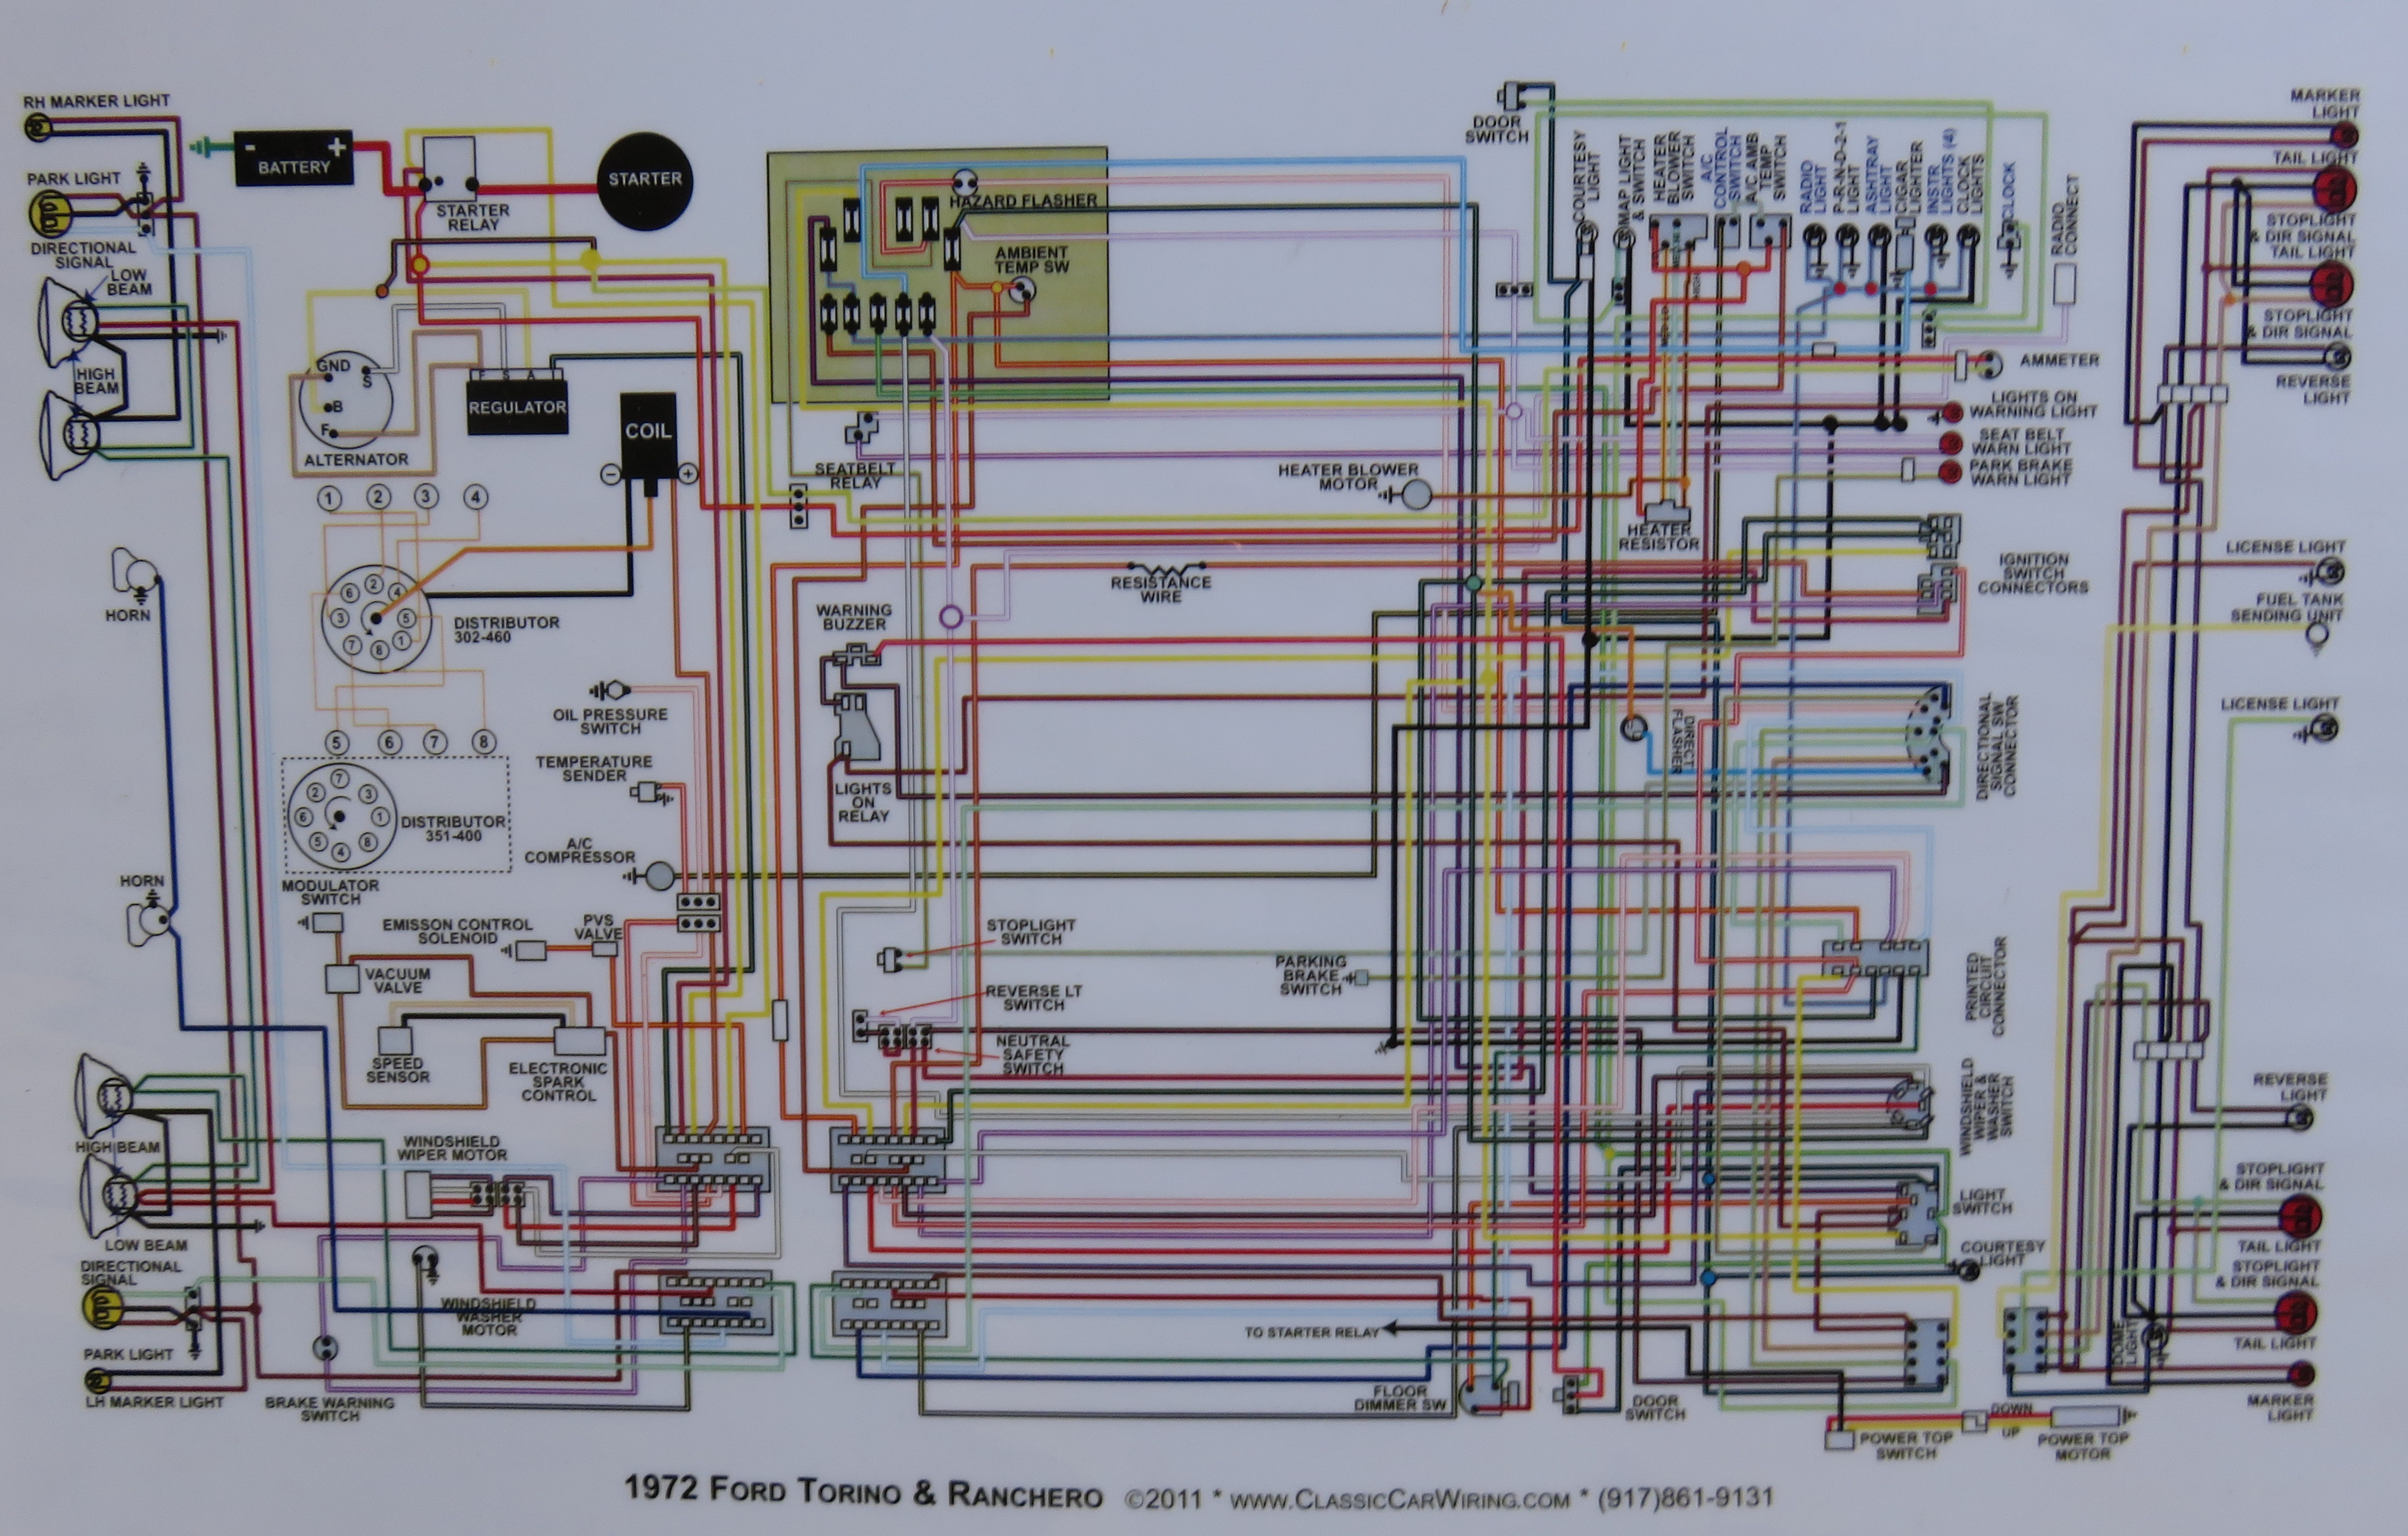 [ZSVE_7041]  TB_2728] 1931 Ford Wiring Diagram Free Schematic Wiring | Ford Gt Wiring Diagram |  | Bletu Birdem Arch Aspi Anist Ricis Lious Elec Mohammedshrine Librar Wiring  101